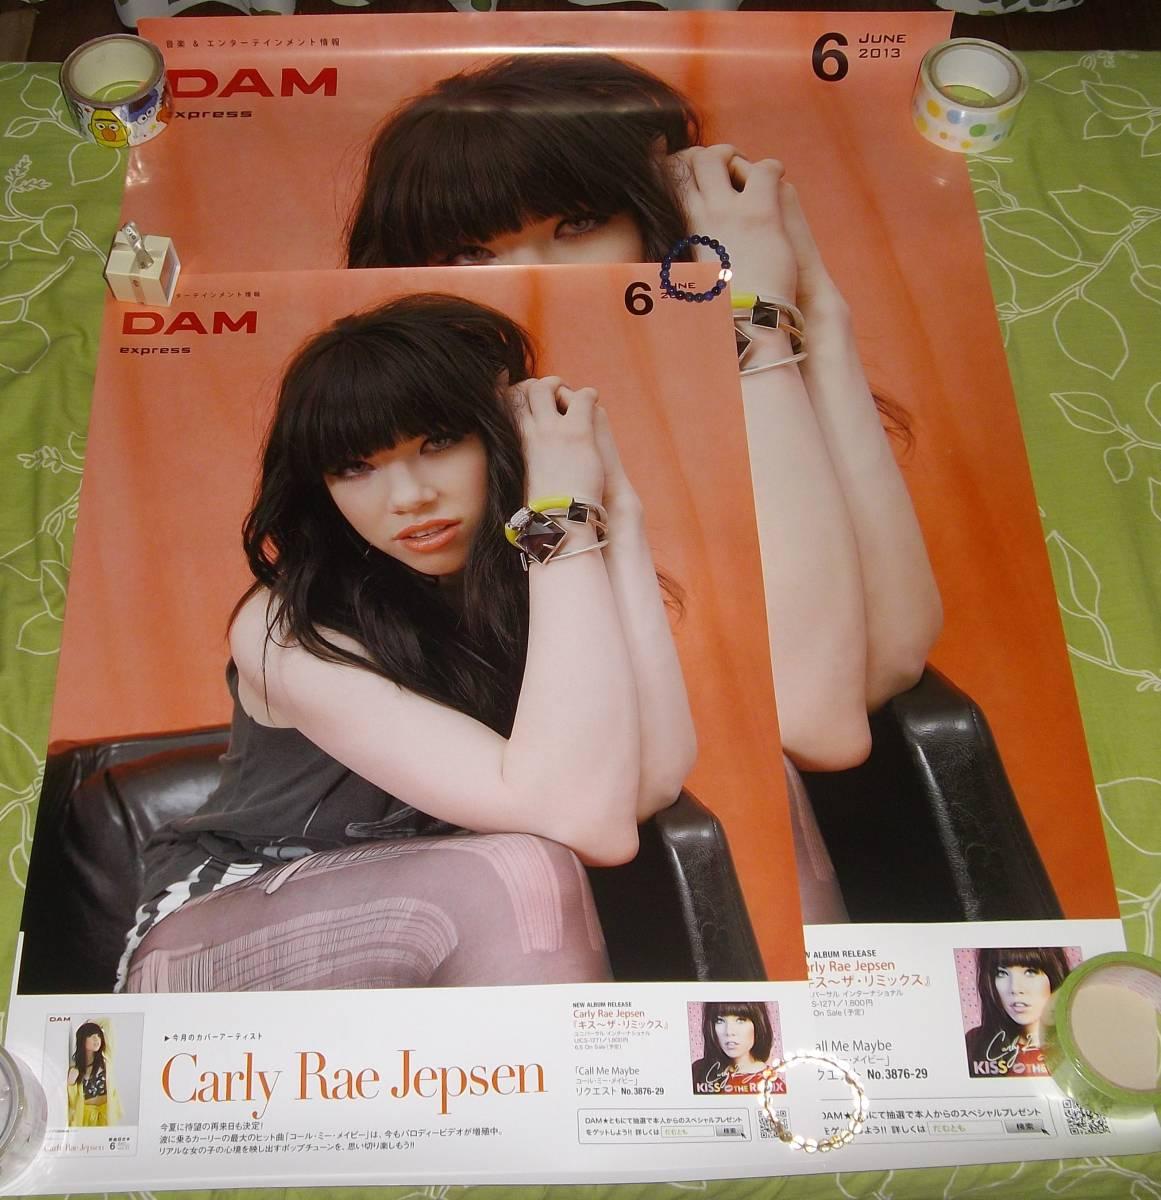 ●DAM2013年 Carly Rae Jepsen/カーリー・レイ・ジェプセン 宣伝・店頭用特大&B2サイズポスター2枚セット 未使用●